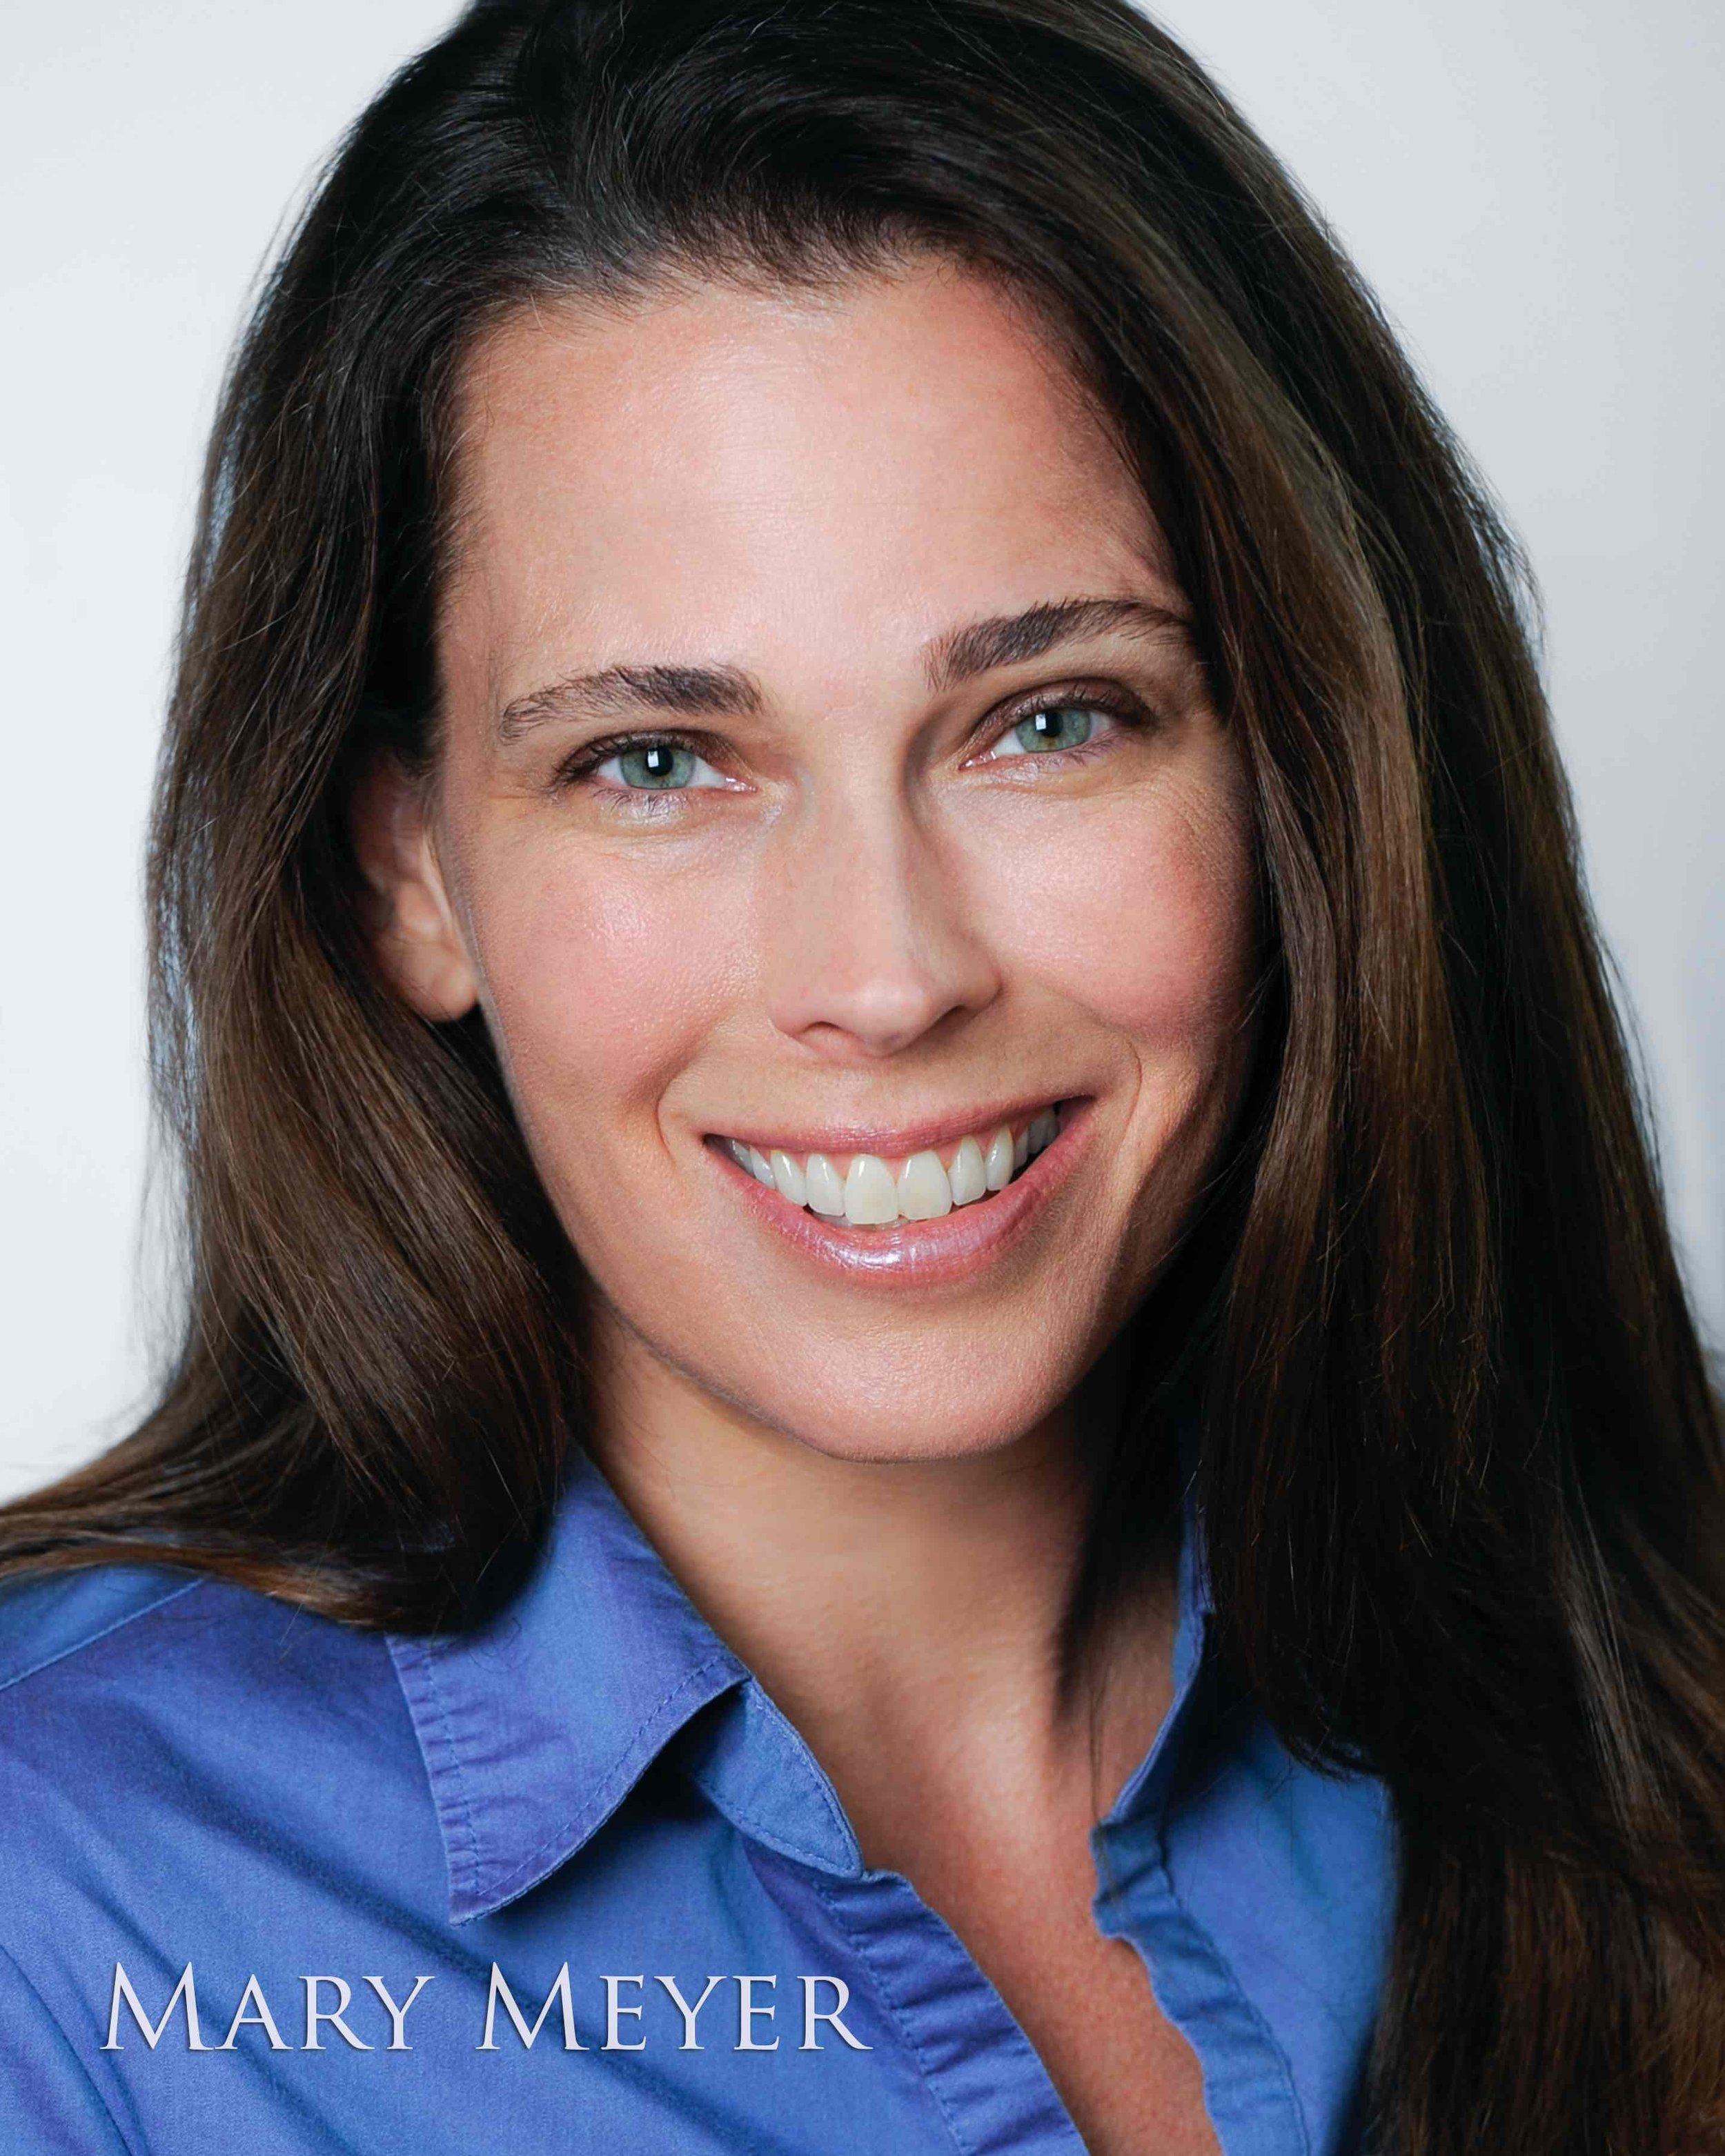 Mary Meyer headshot commercial.jpg